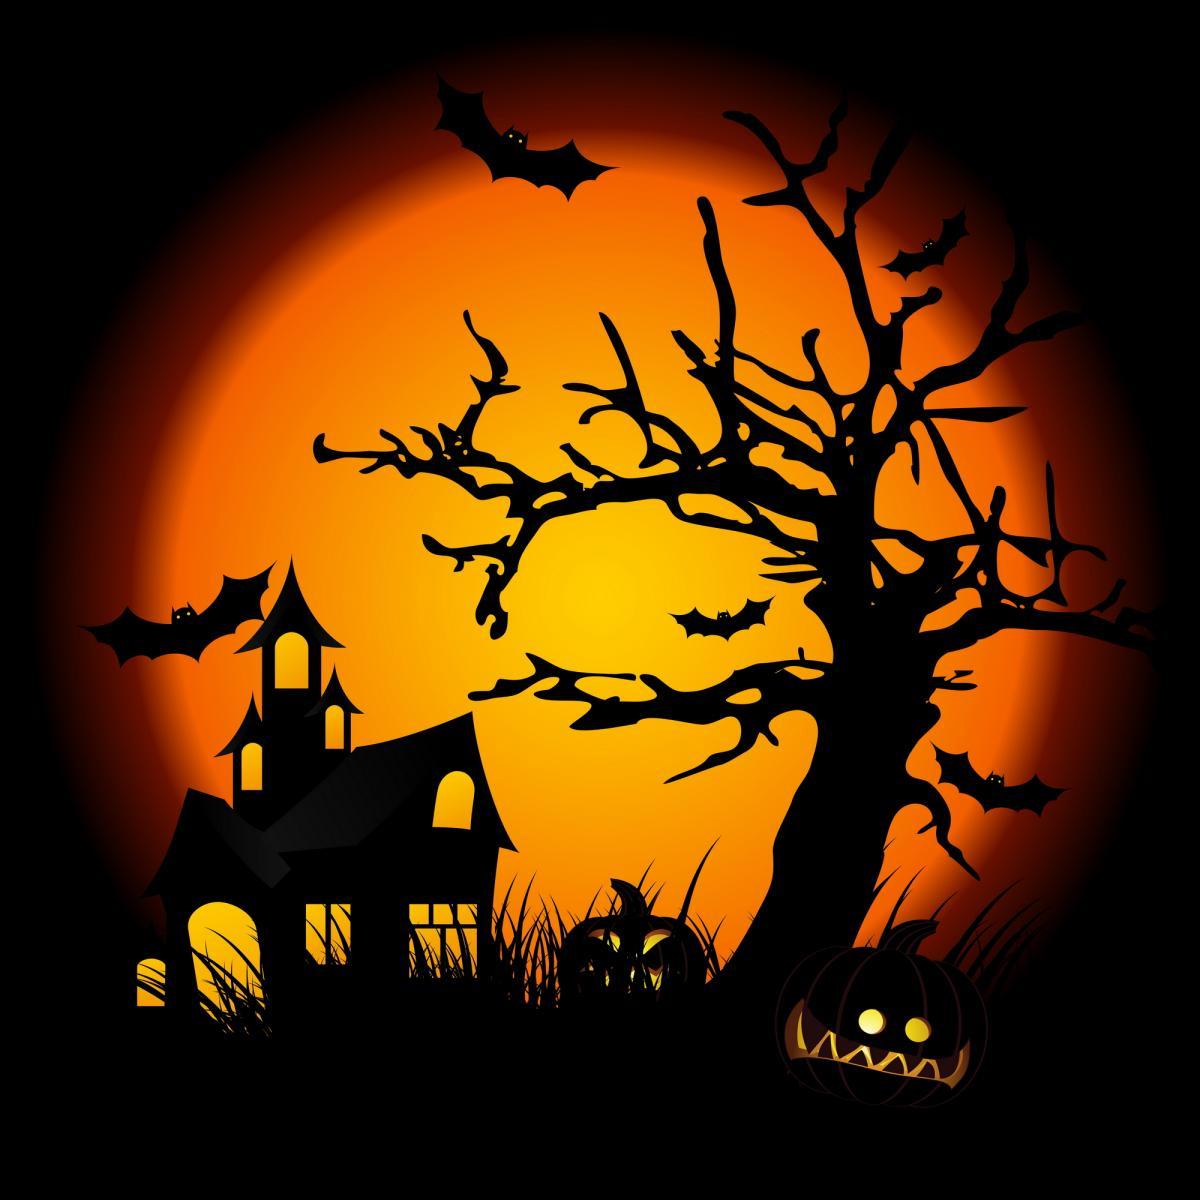 Scray Halloween House